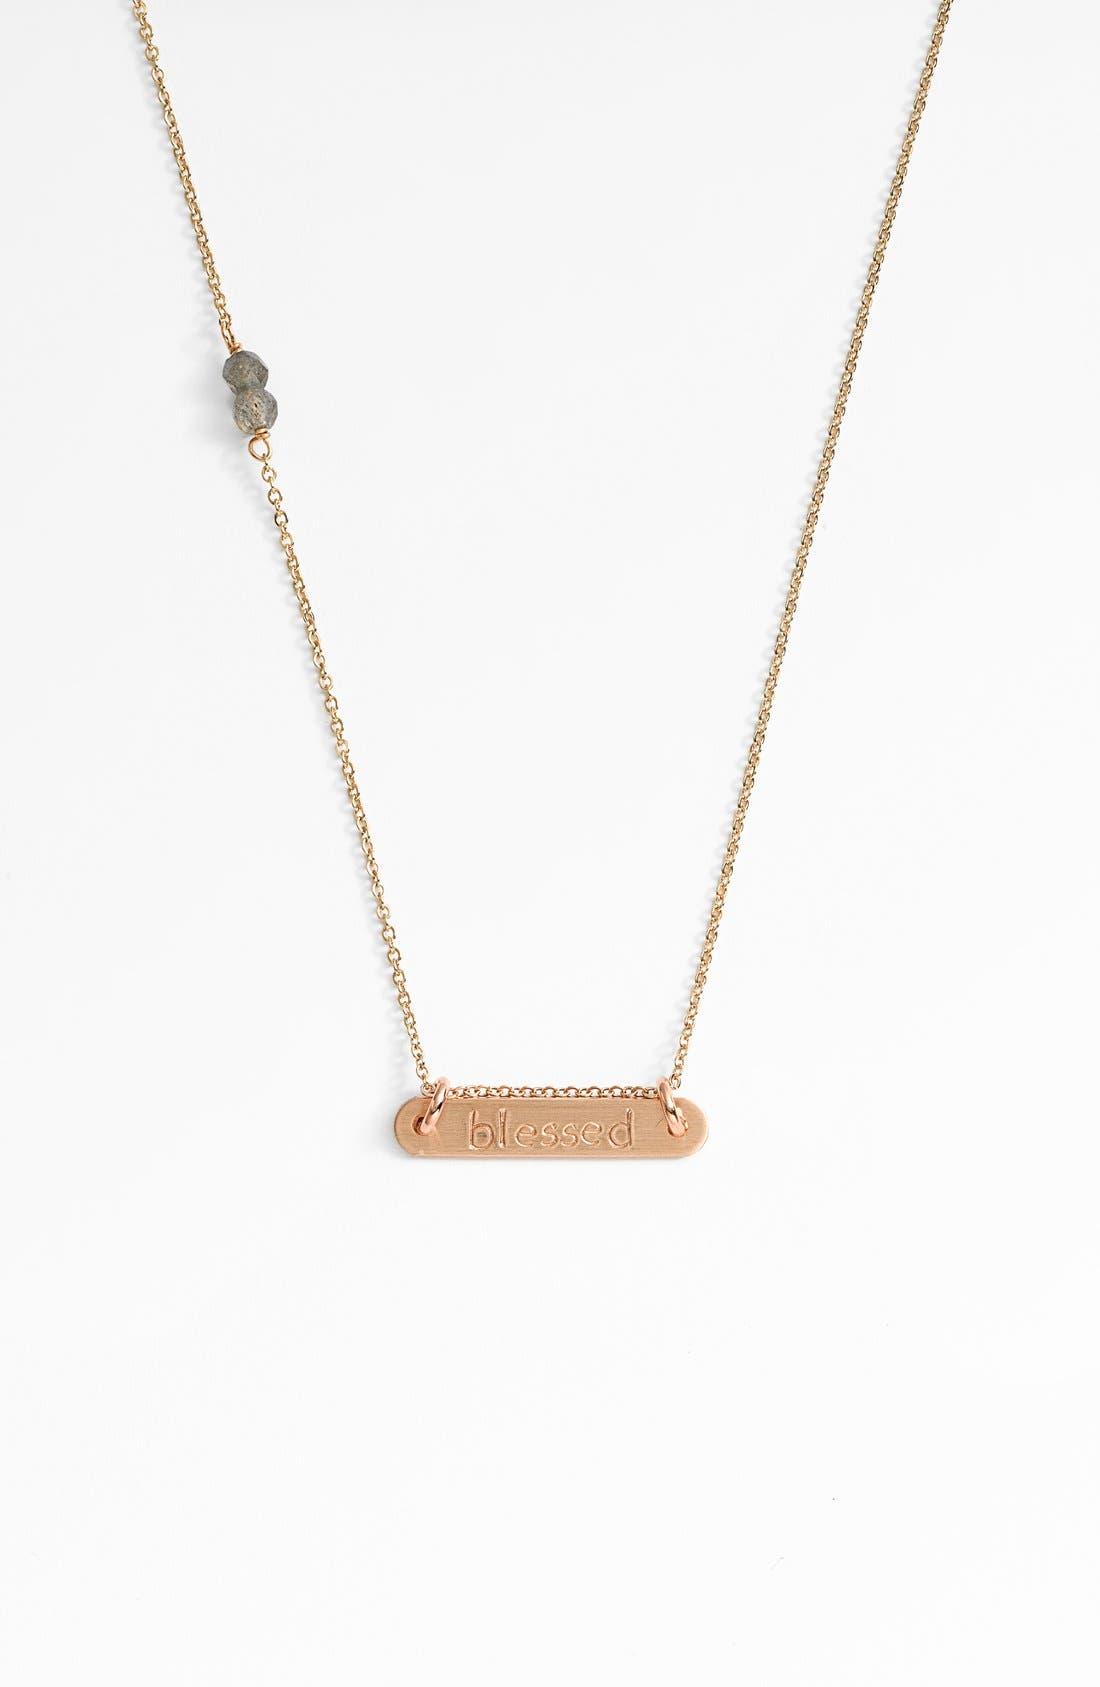 Main Image - Nashelle 'Blessed' 14k Gold-Fill Bar Necklace